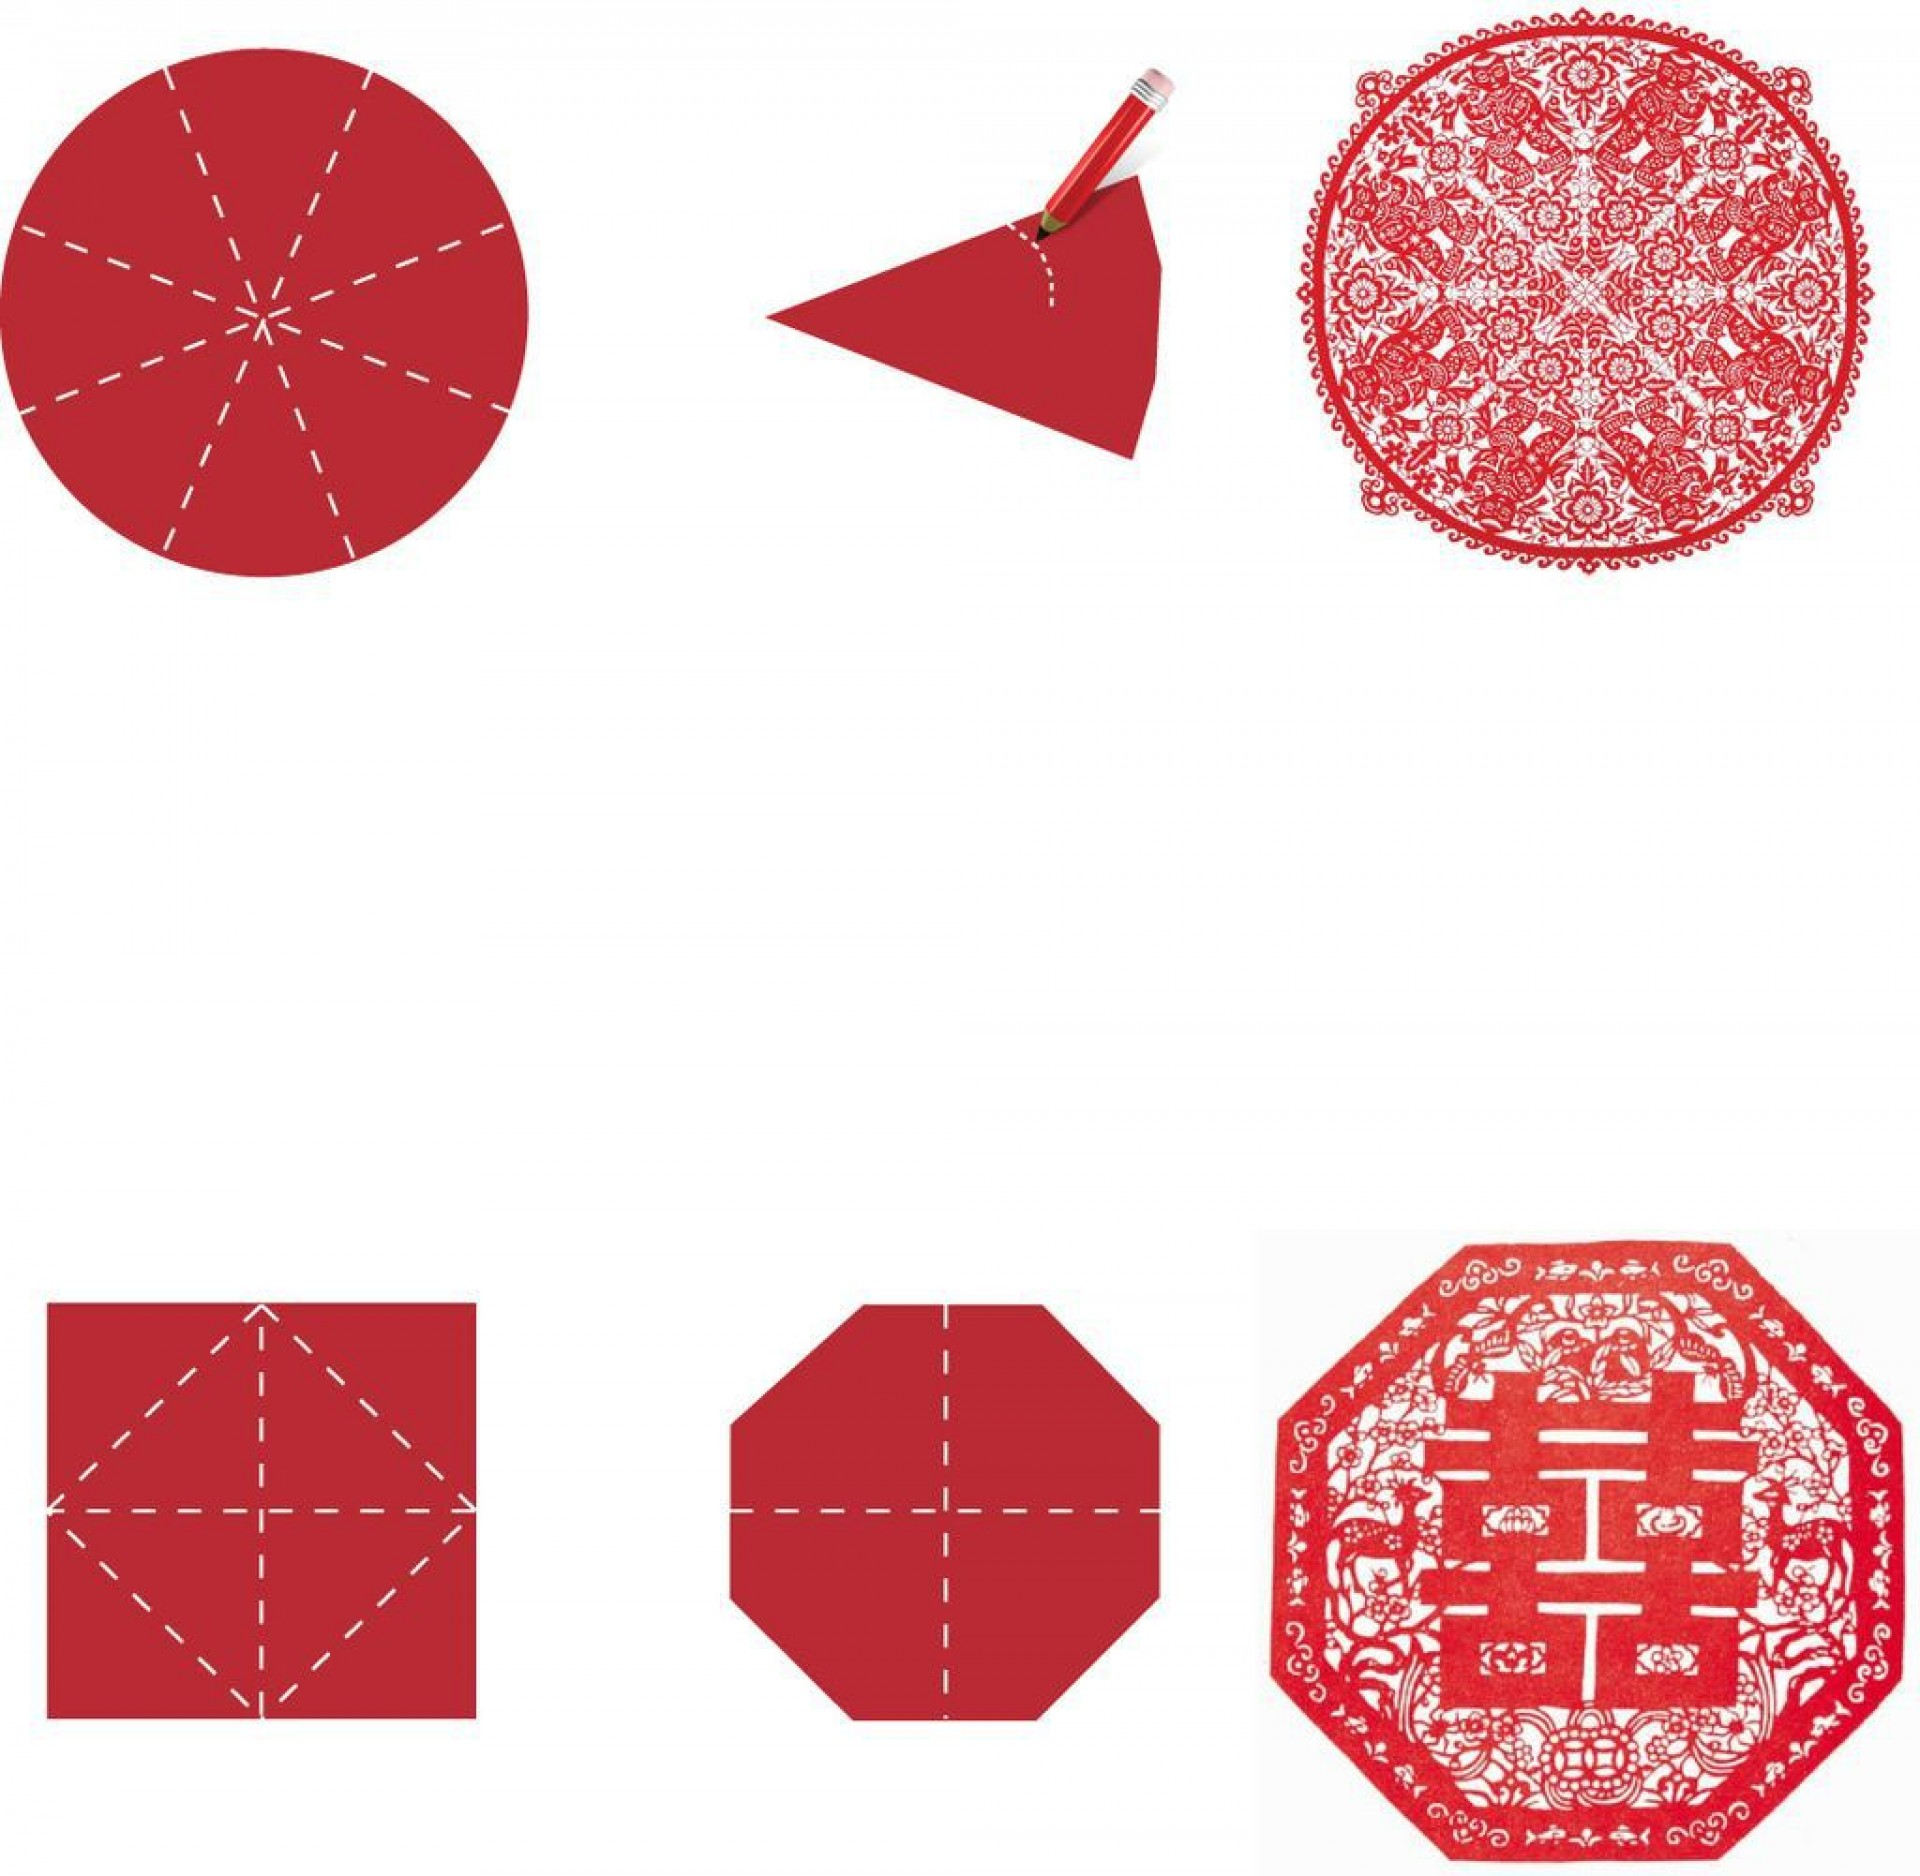 006 Unbelievable Chinese Paper Cut Template Photo  Templates Zodiac1920